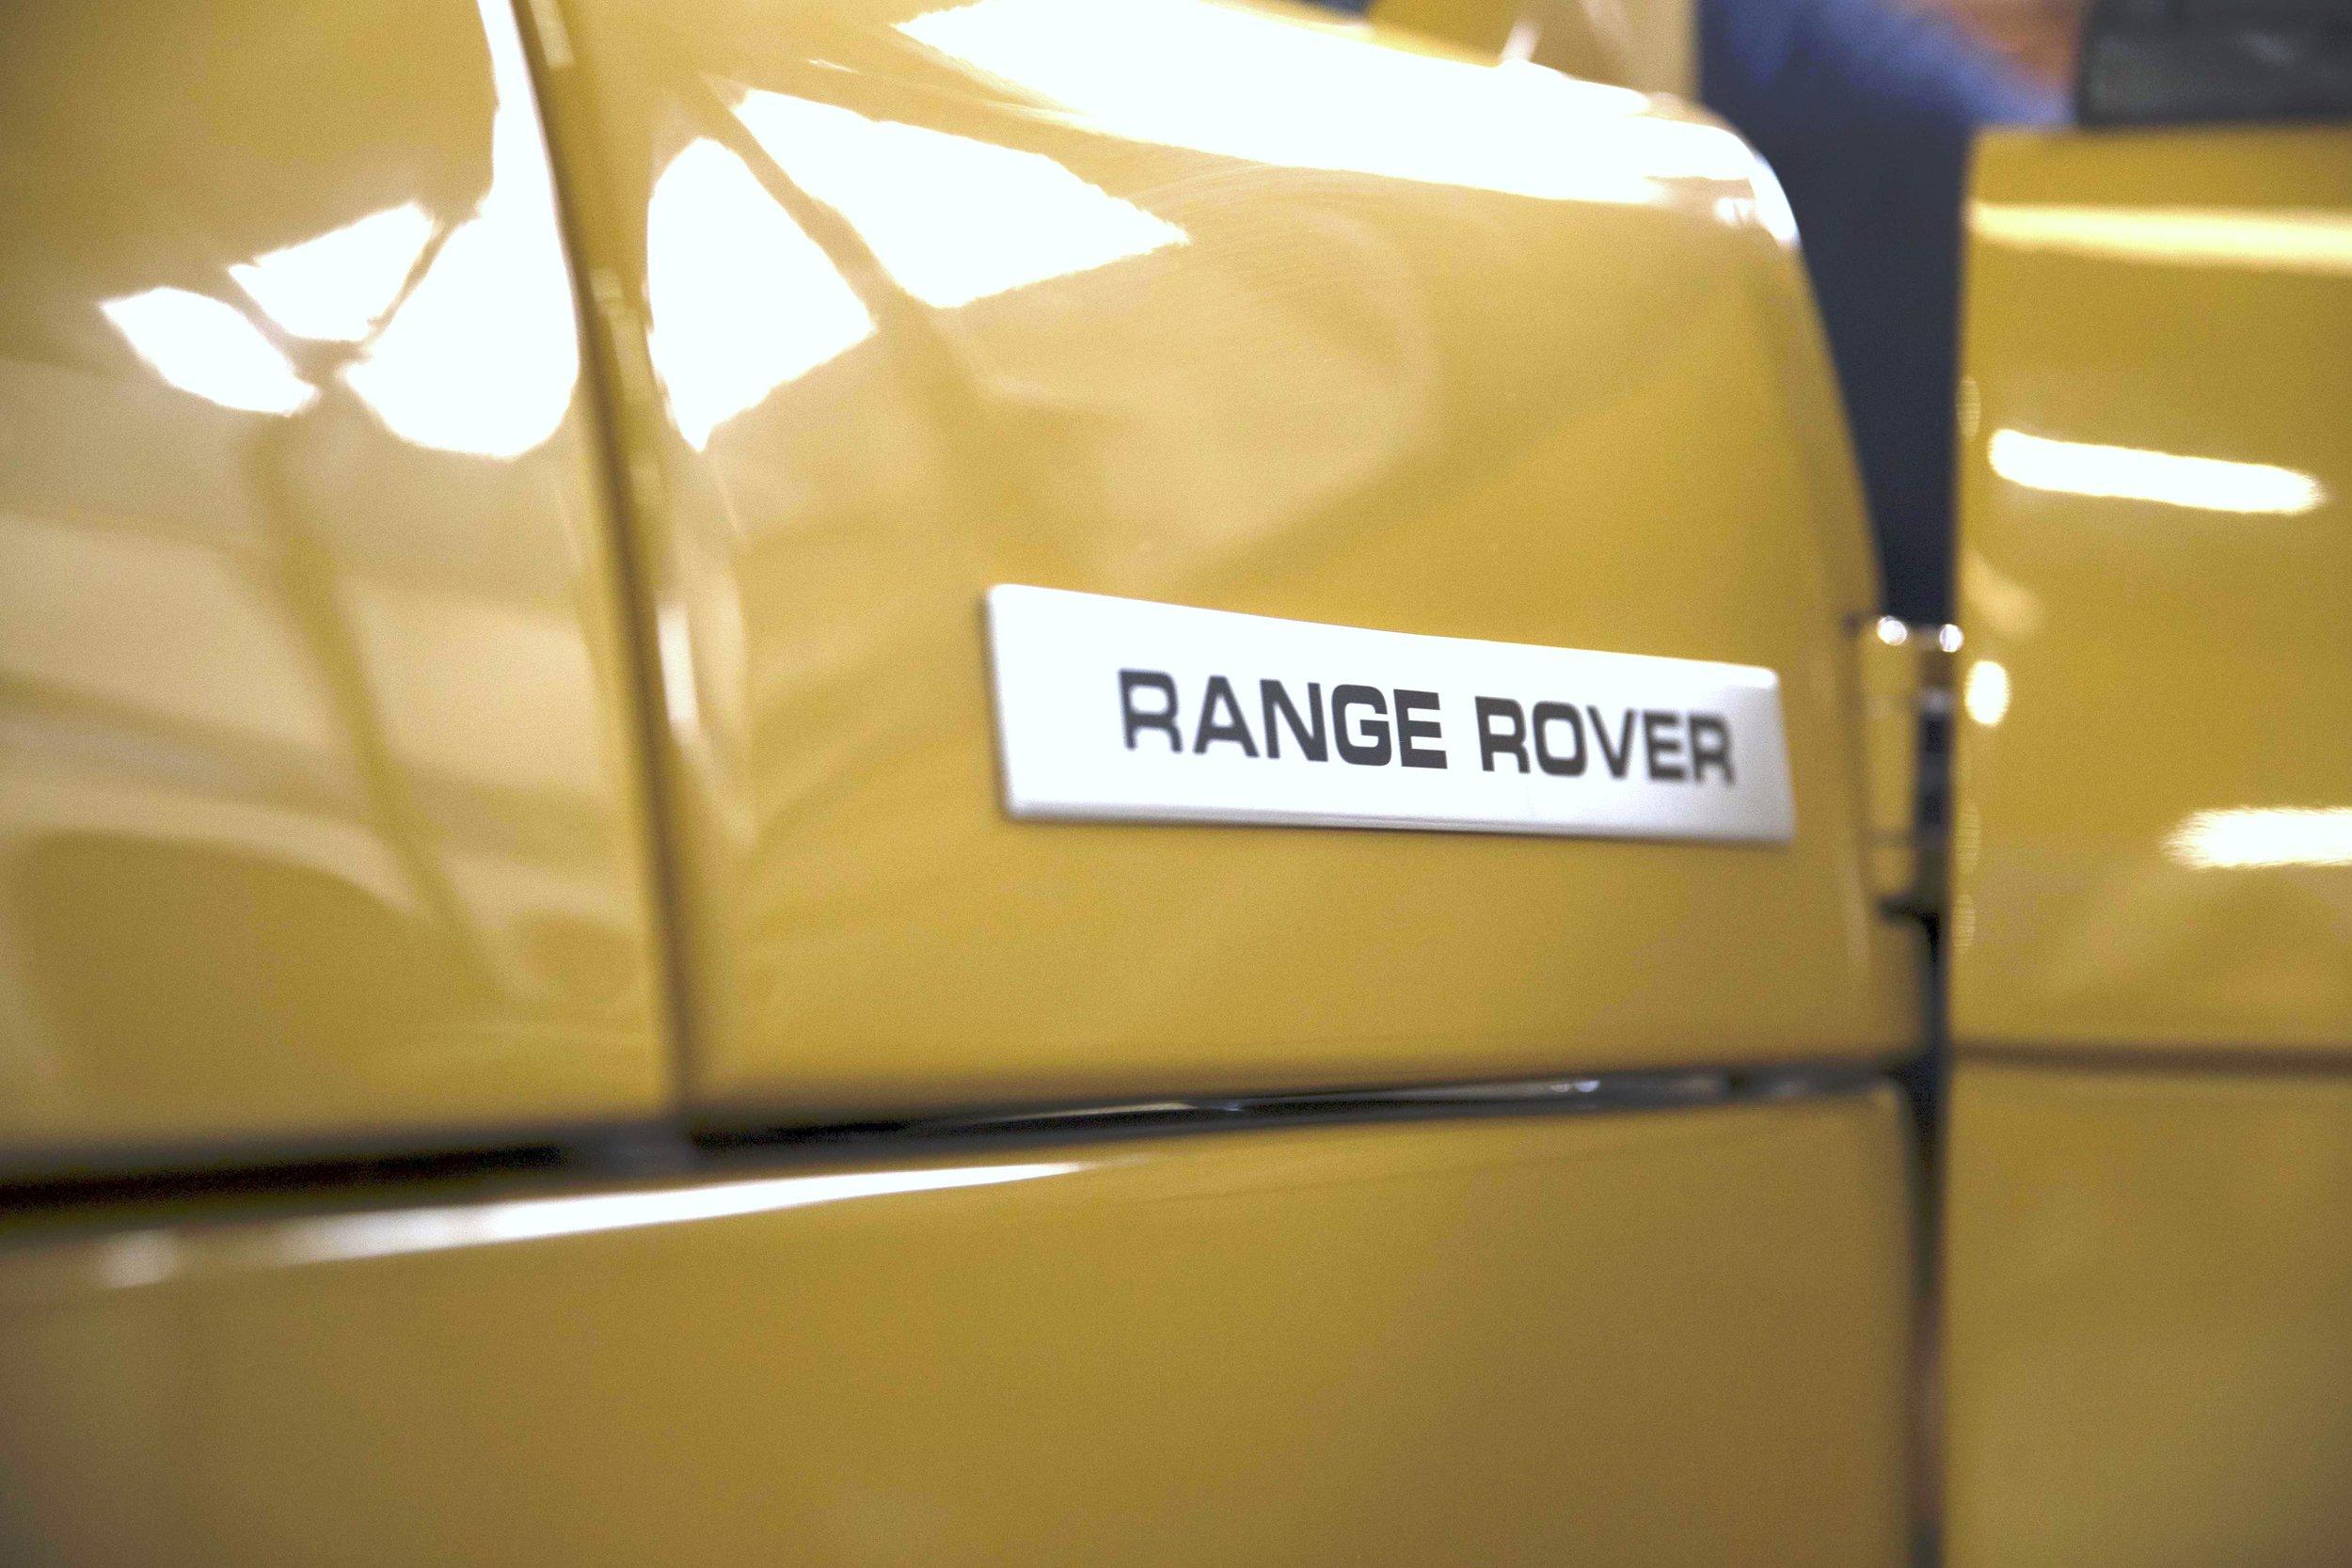 LegacyOverland_1973_RangeRover_shop1.jpg